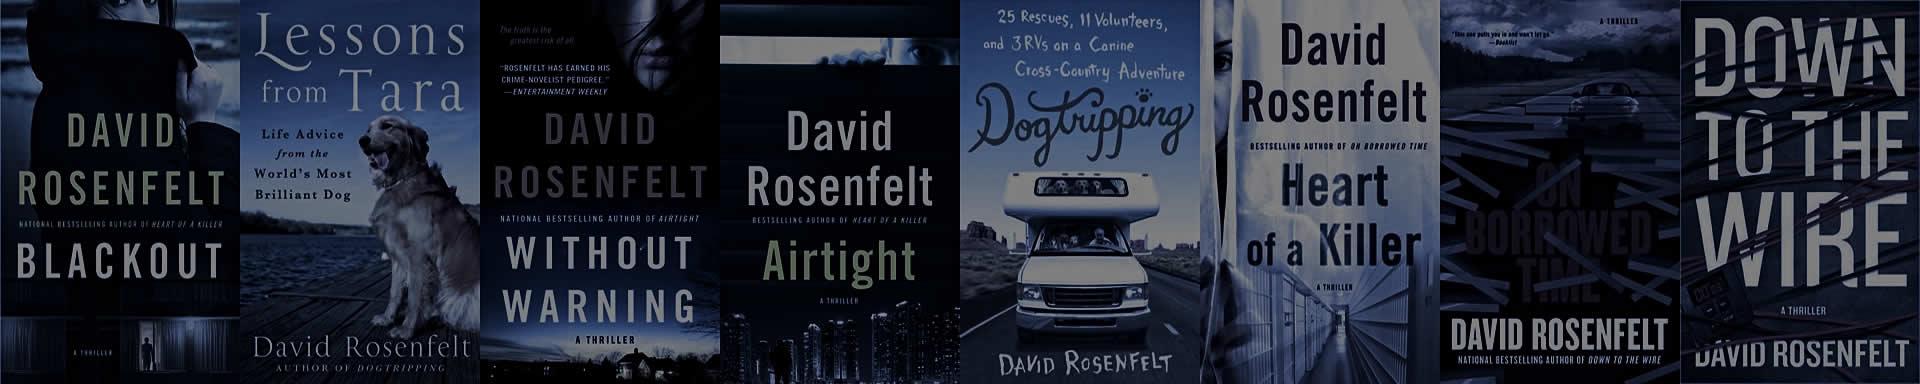 Stand Alone Books by David Rosenfelt